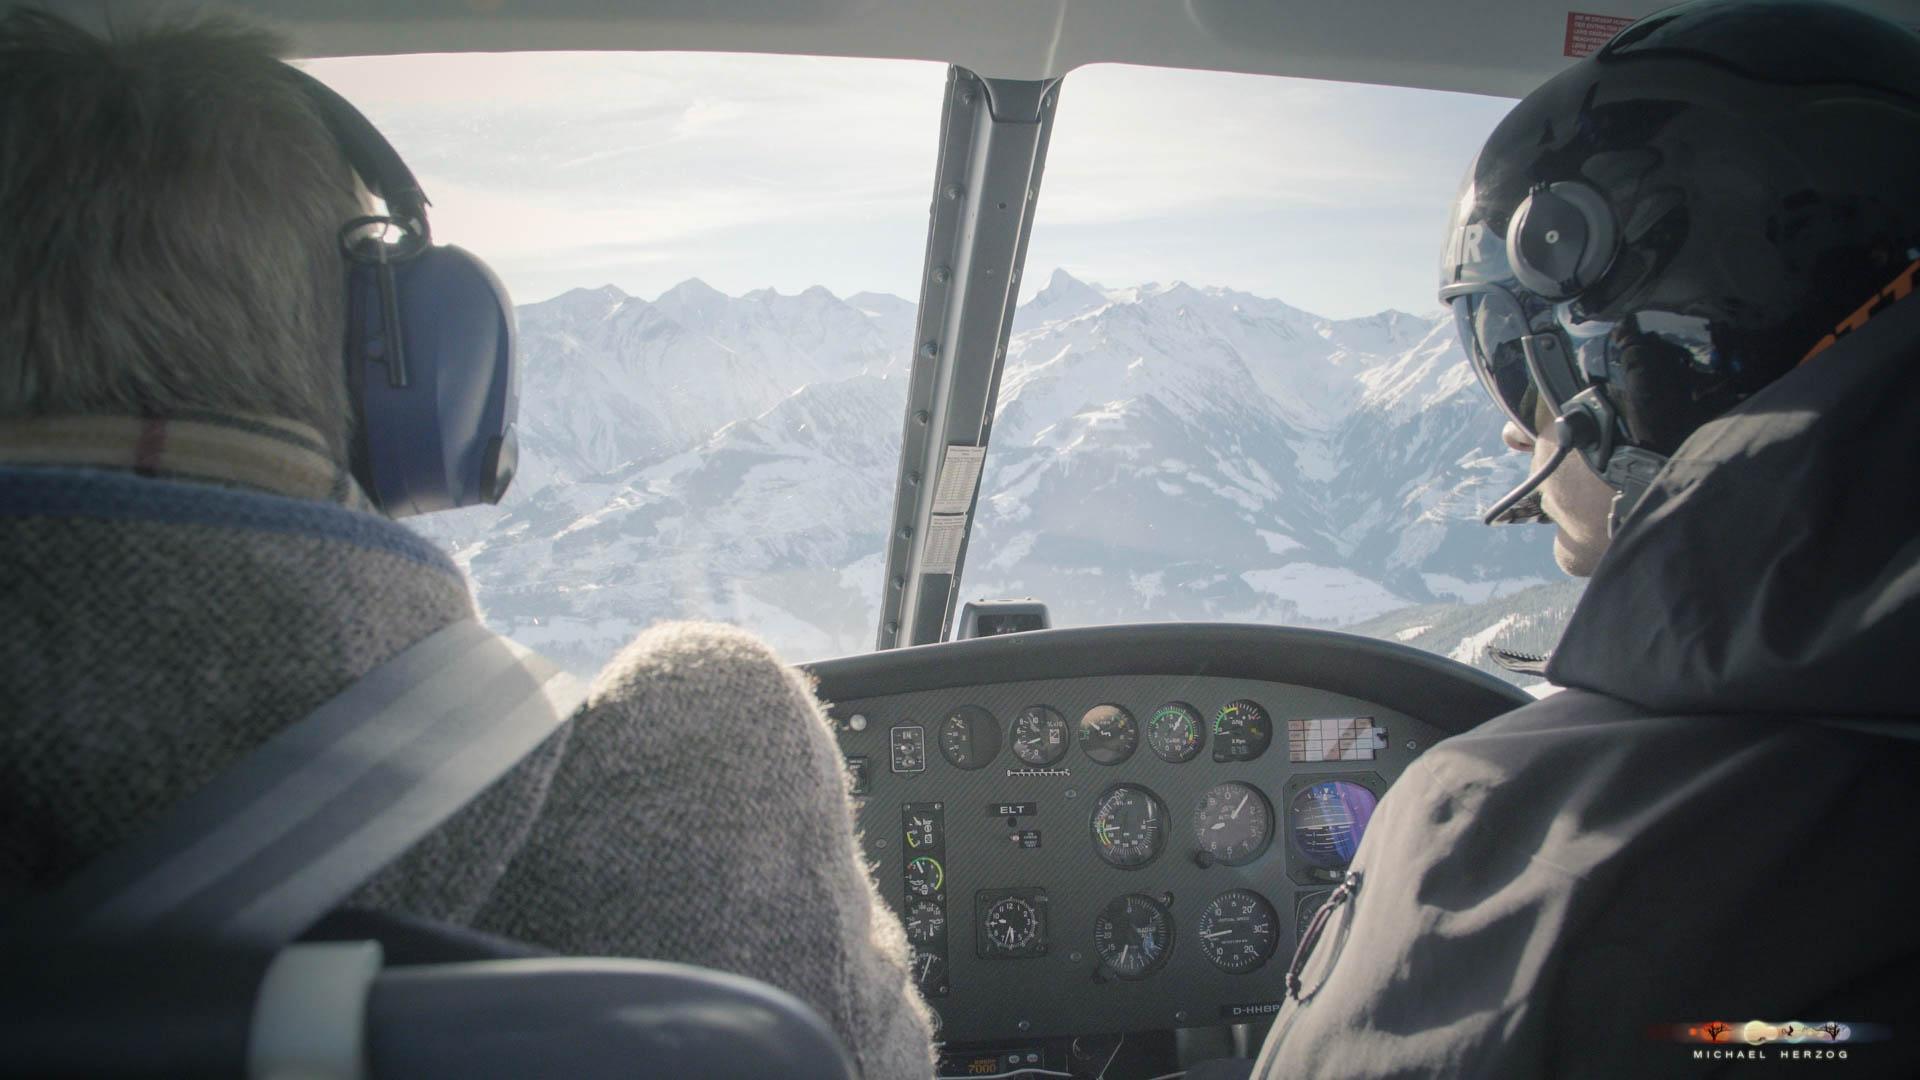 Saalbach-Hinterglemm_Hubschrauber2_AUTrenalinMEDIA-23.jpg